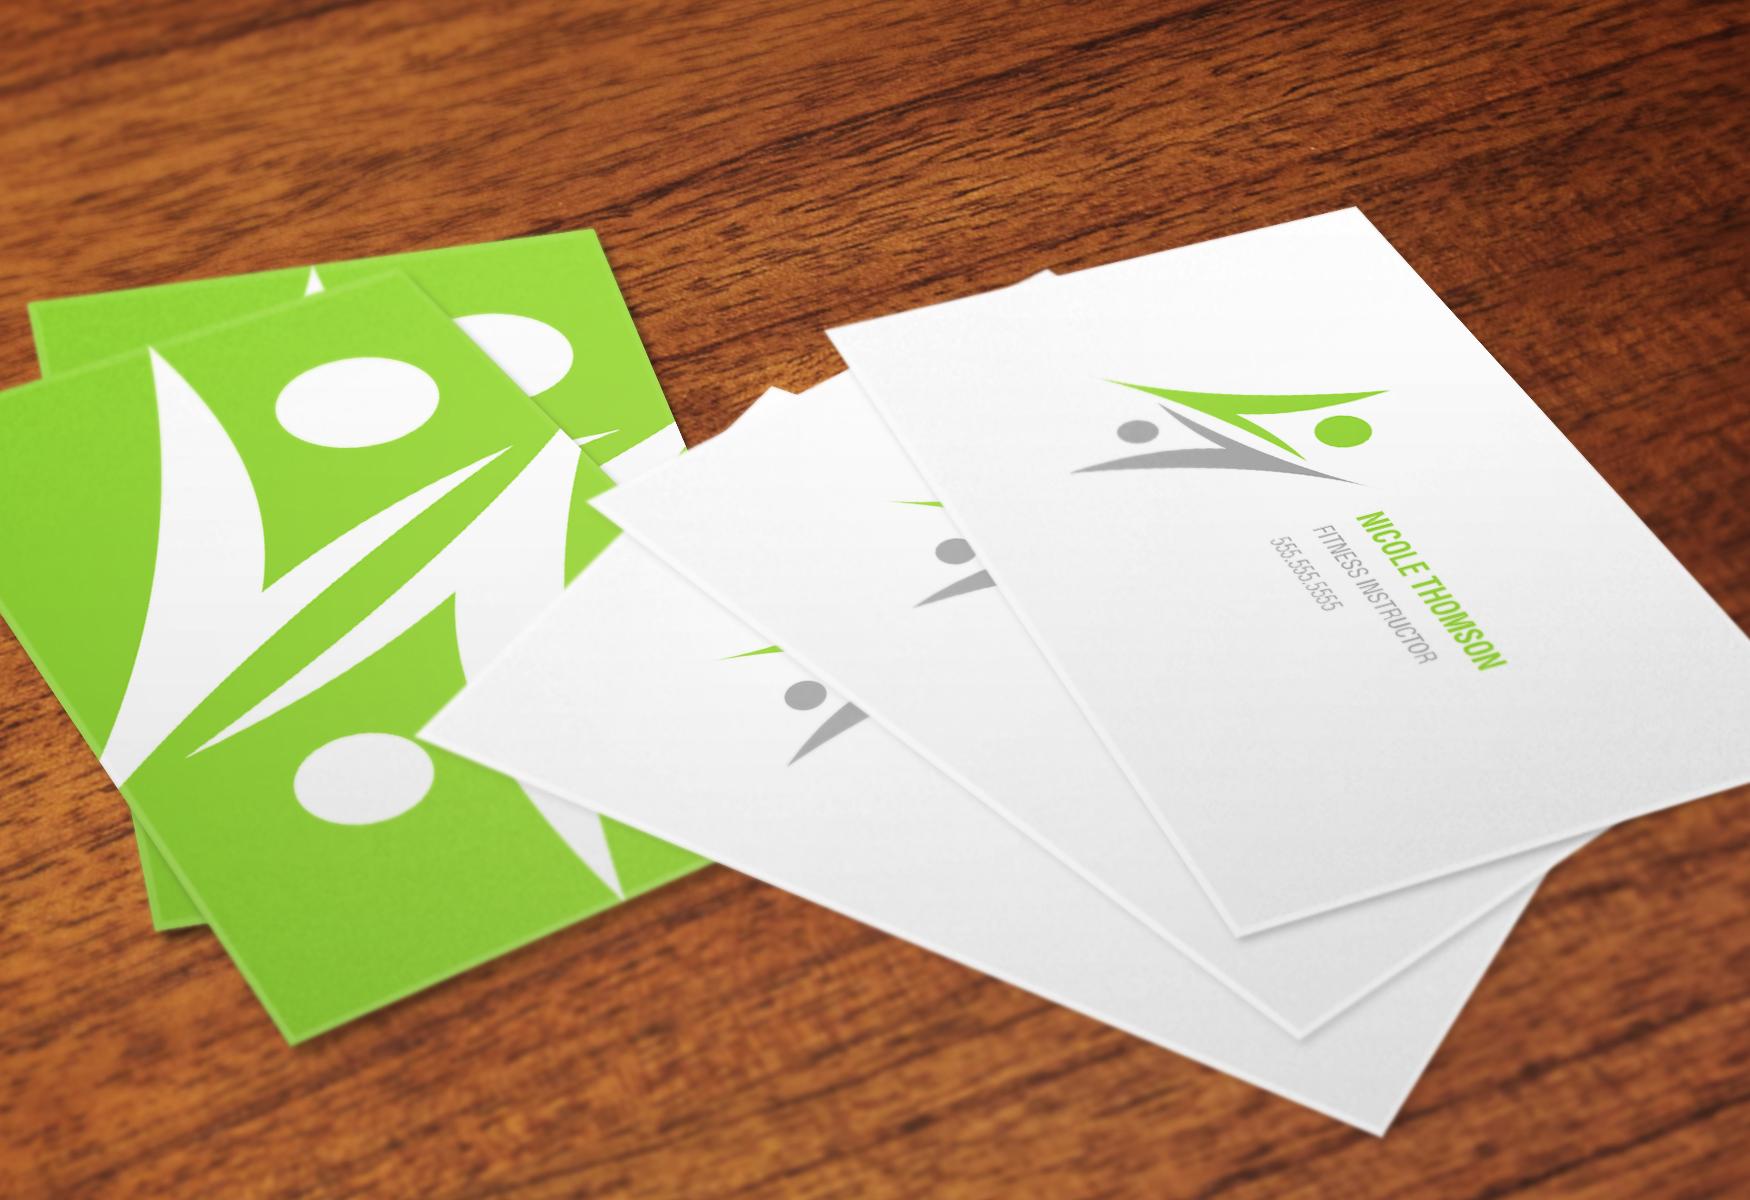 Fantastic Matte Business Cards Matte Business Cards Printing Business Cards Printing Matte Business Cards Glossy Text Matte Black Business Cards Design dpreview Matte Business Cards